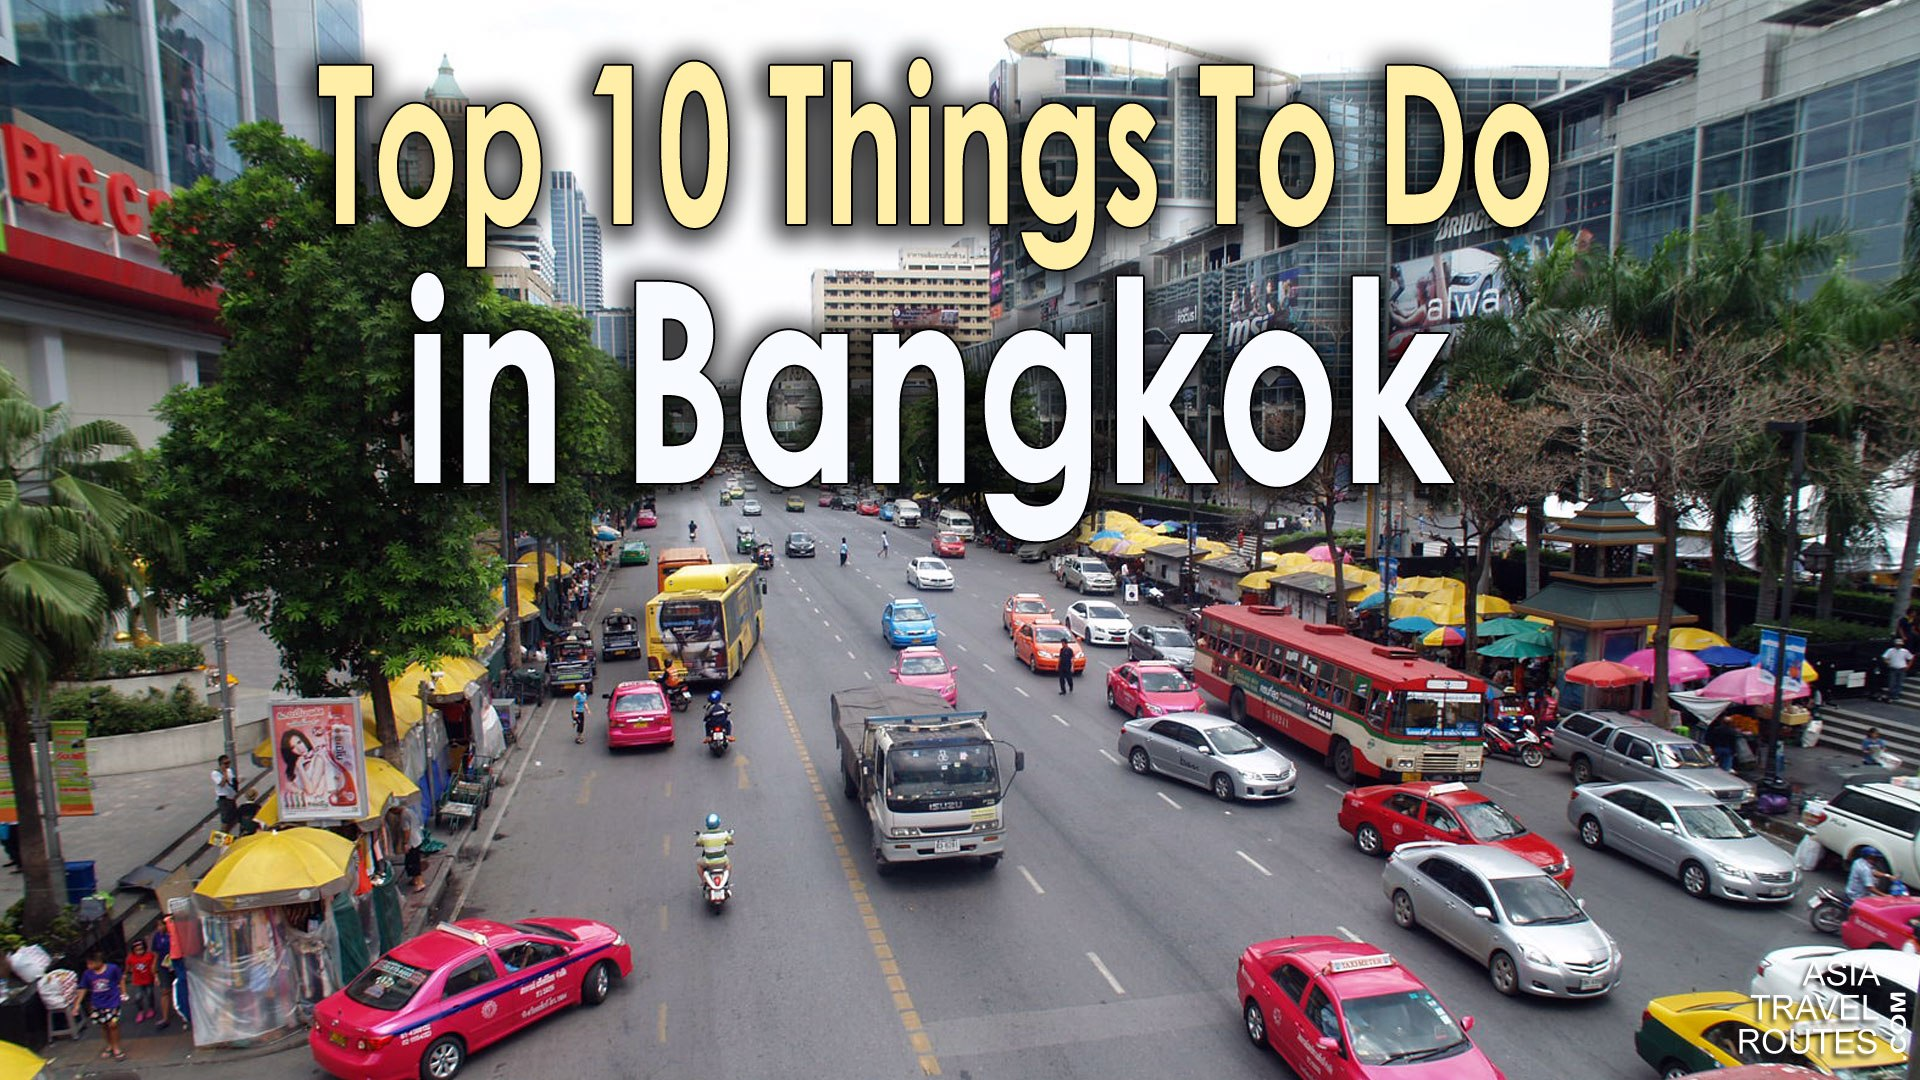 Top 10 Things To Do in Bangkok